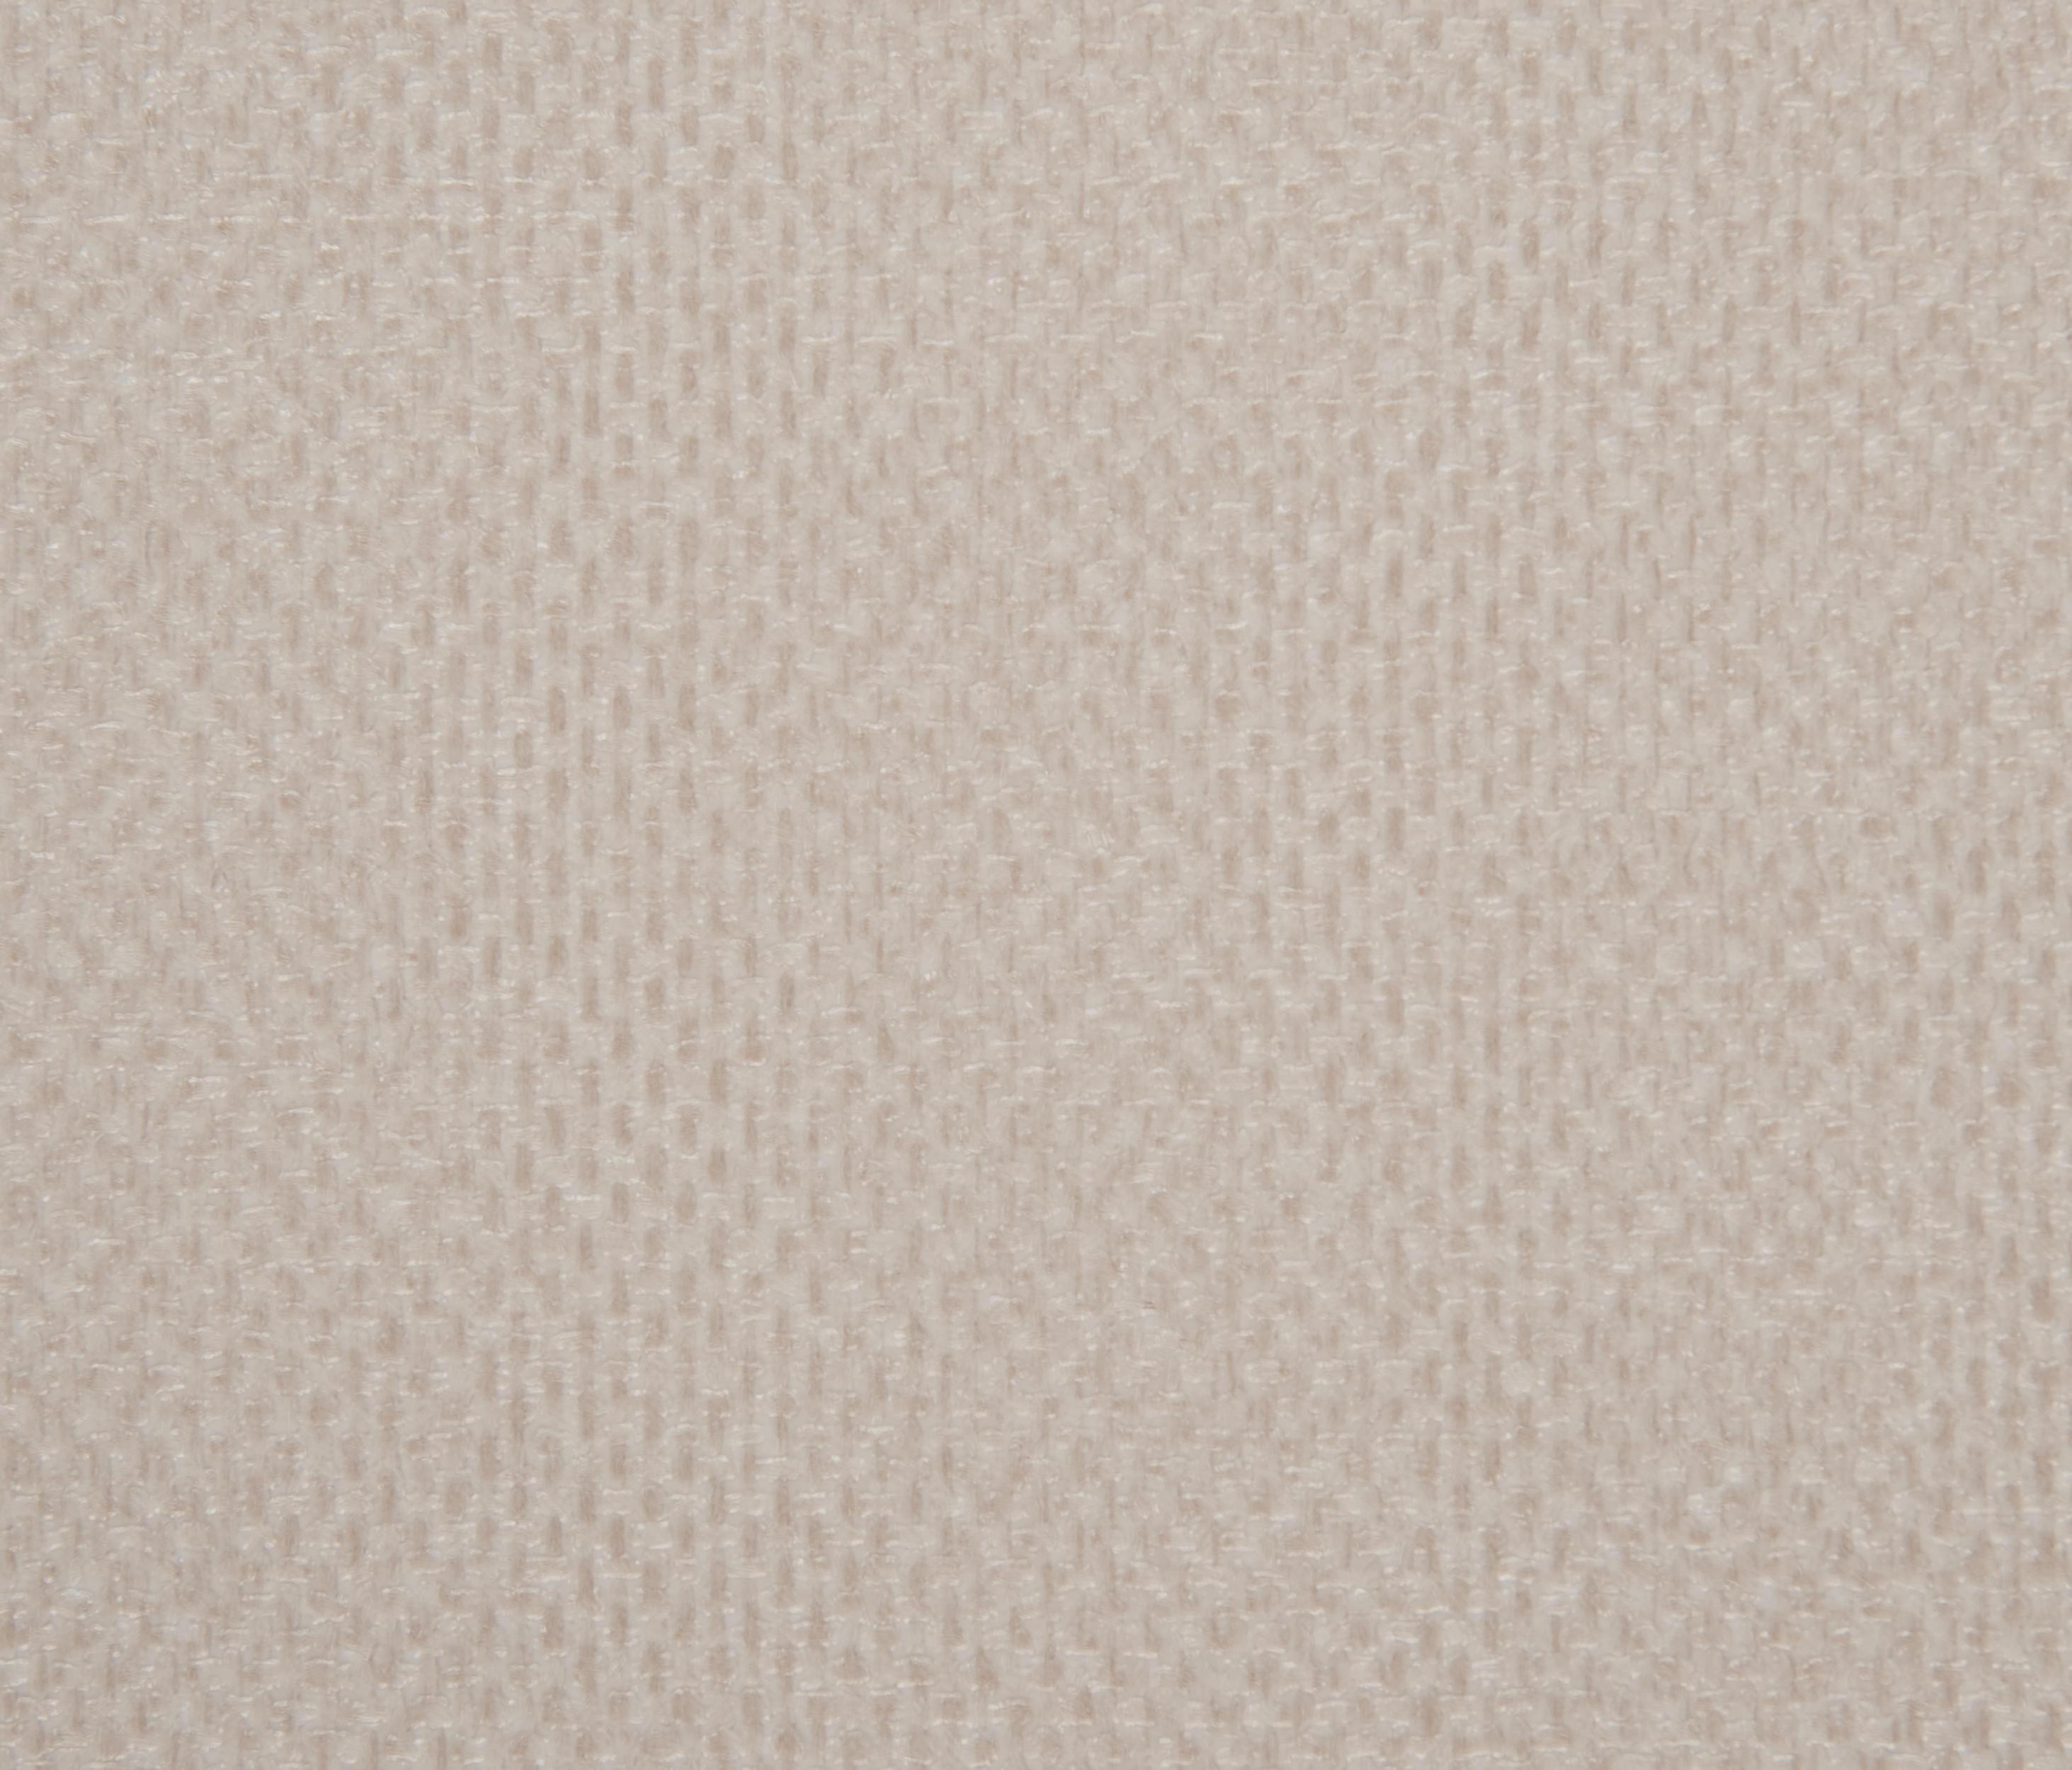 3m di noc architectural finish fe 813 weave l minas for Laminas adhesivas pared